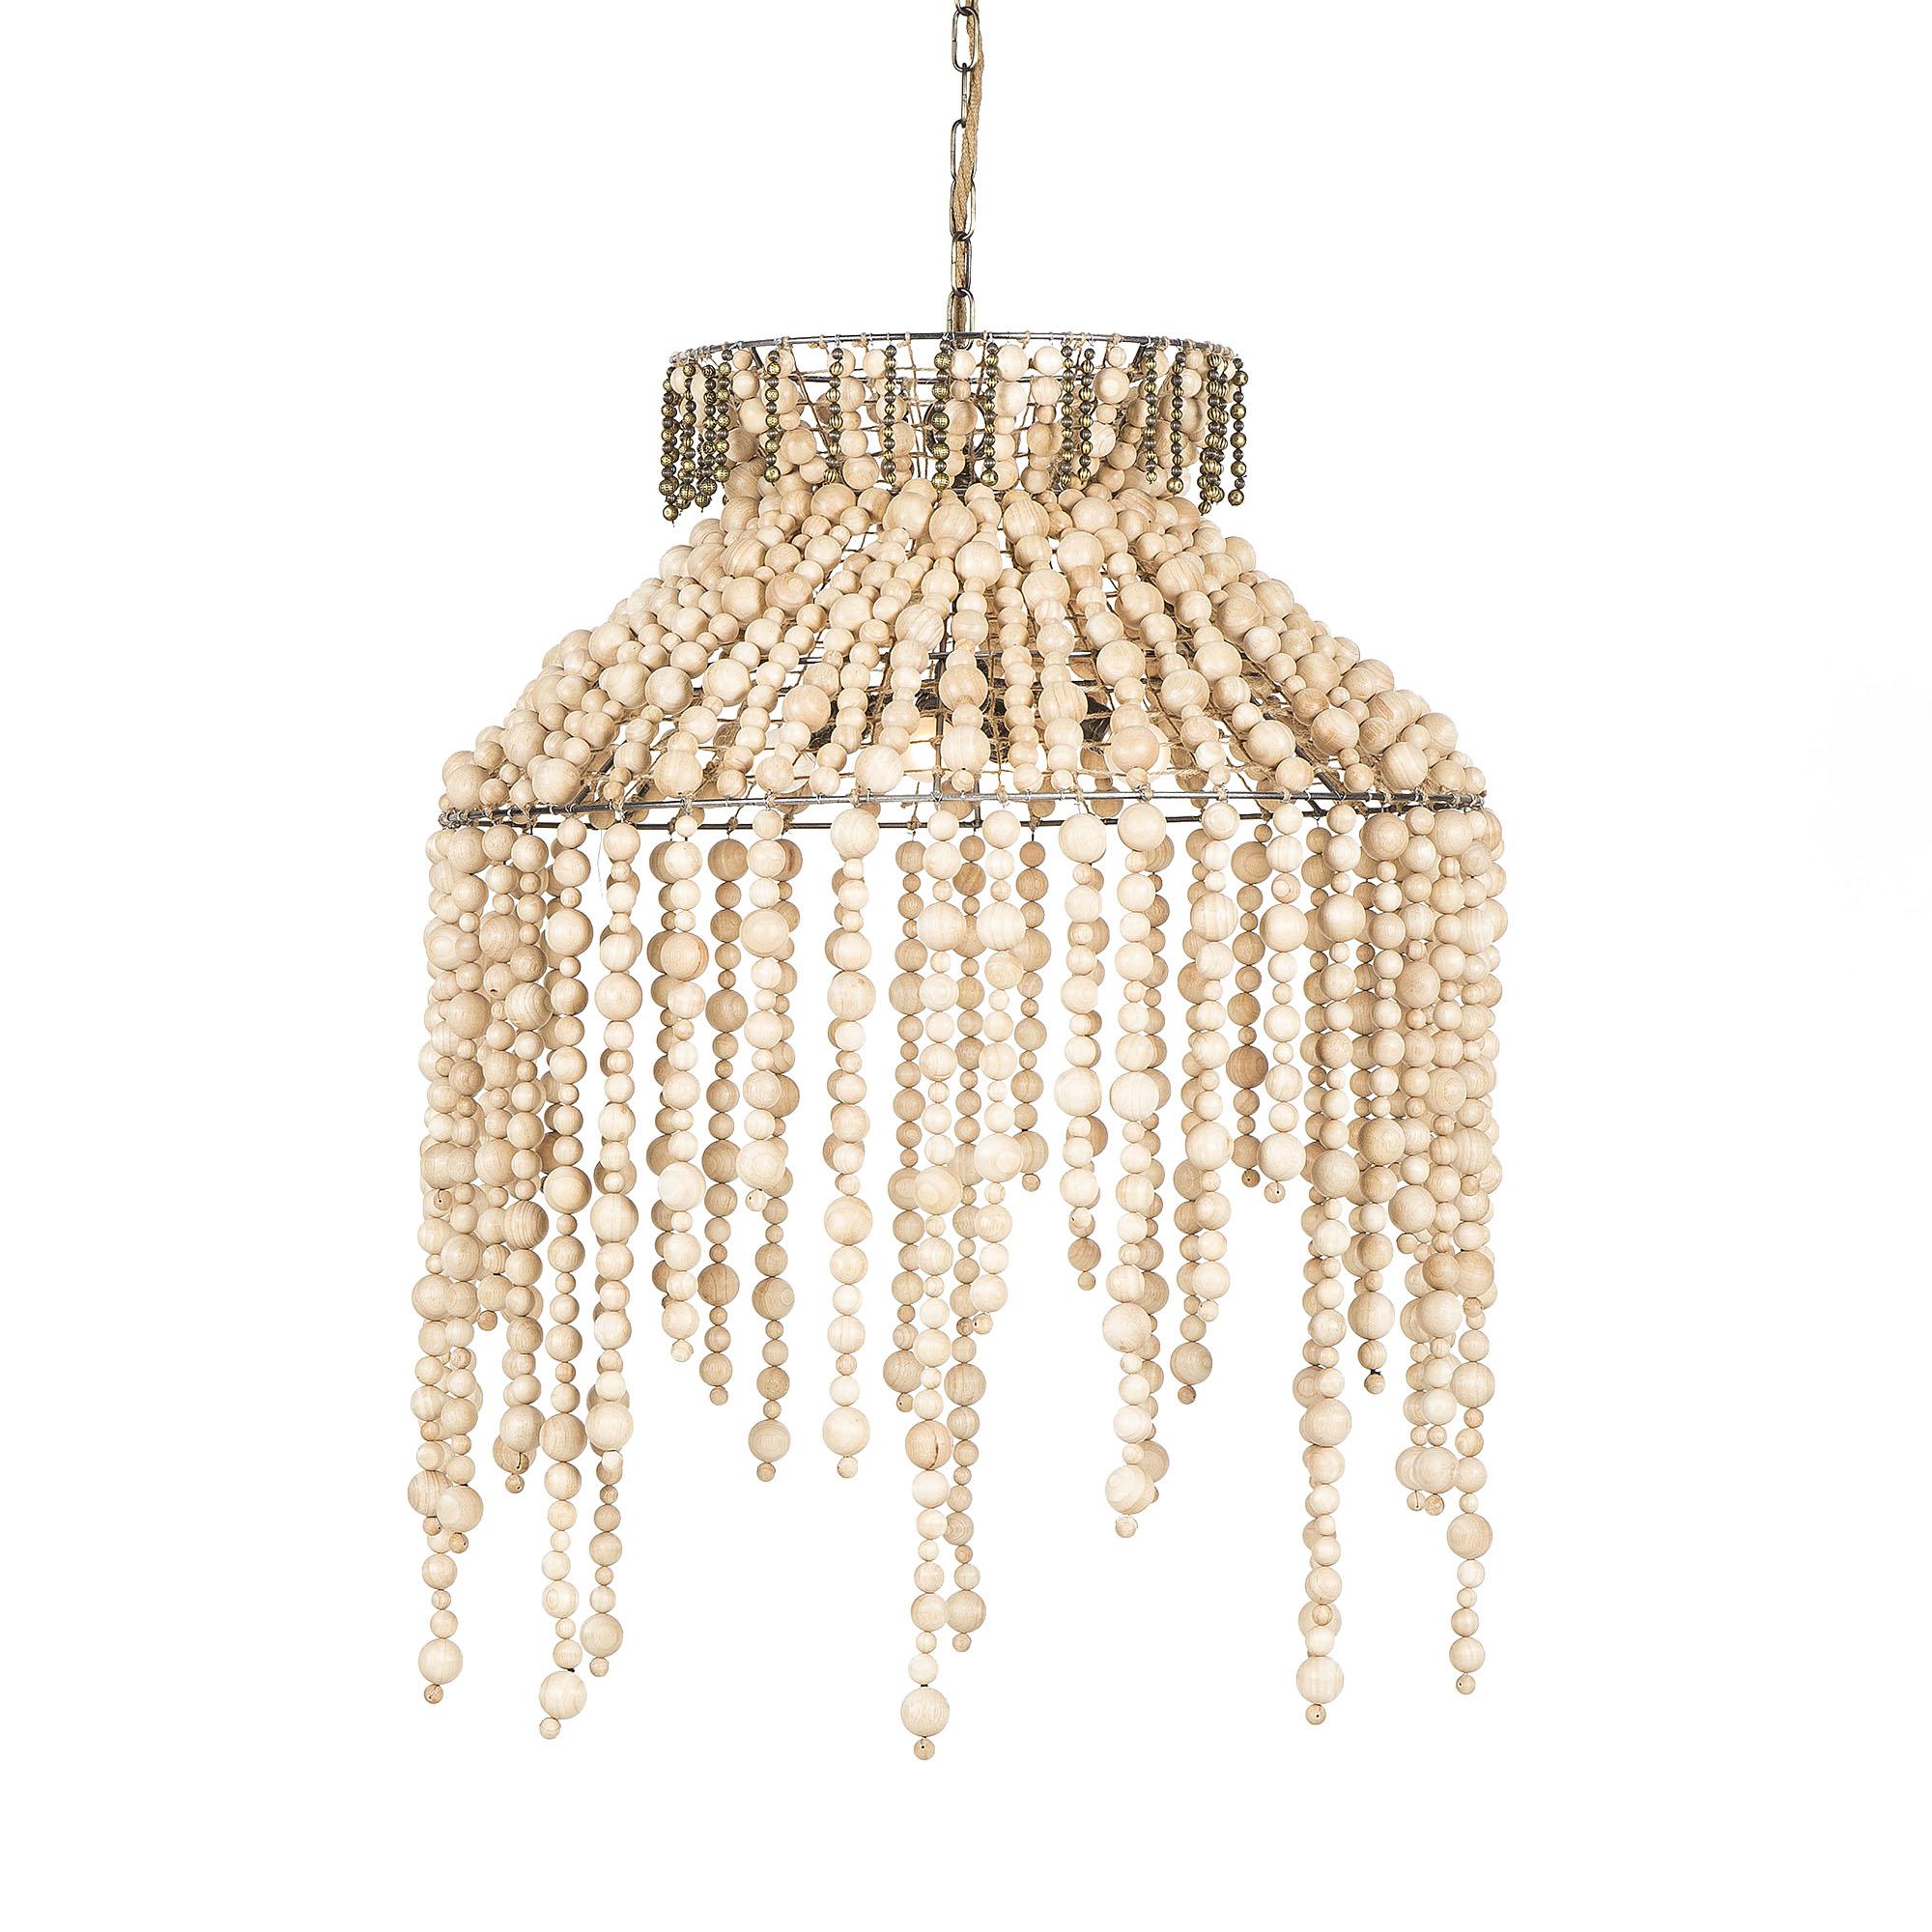 Nellcote_Studio_wood bead draped chandelier.jpg